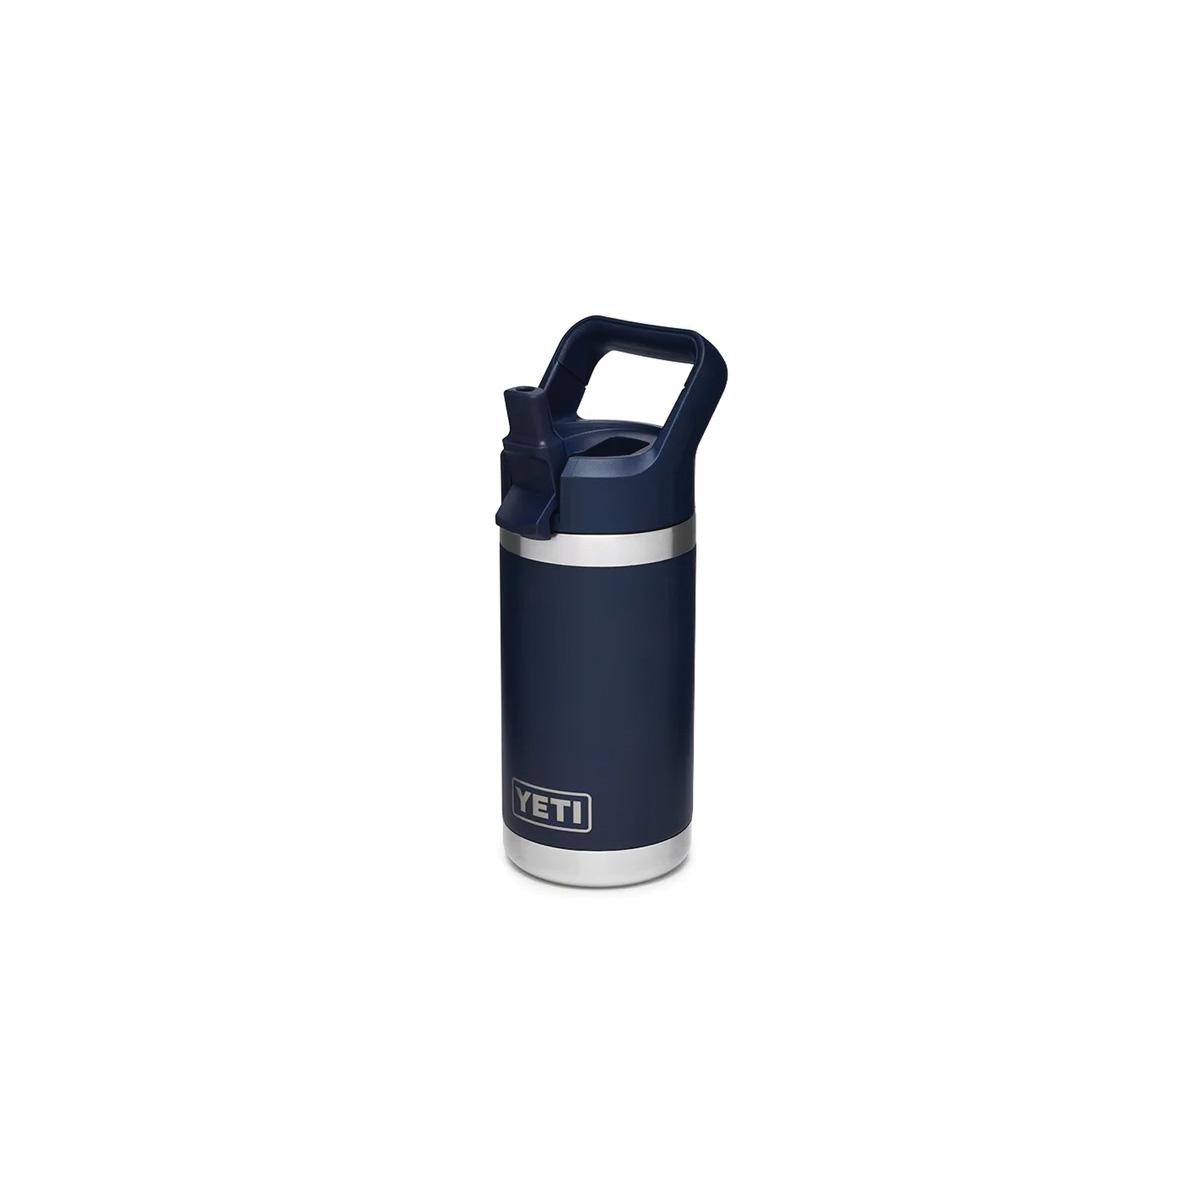 Picture of YETI Rambler 21071500110 Jr. Kids Bottle, 12 oz Capacity, 18/8 Stainless Steel, Navy